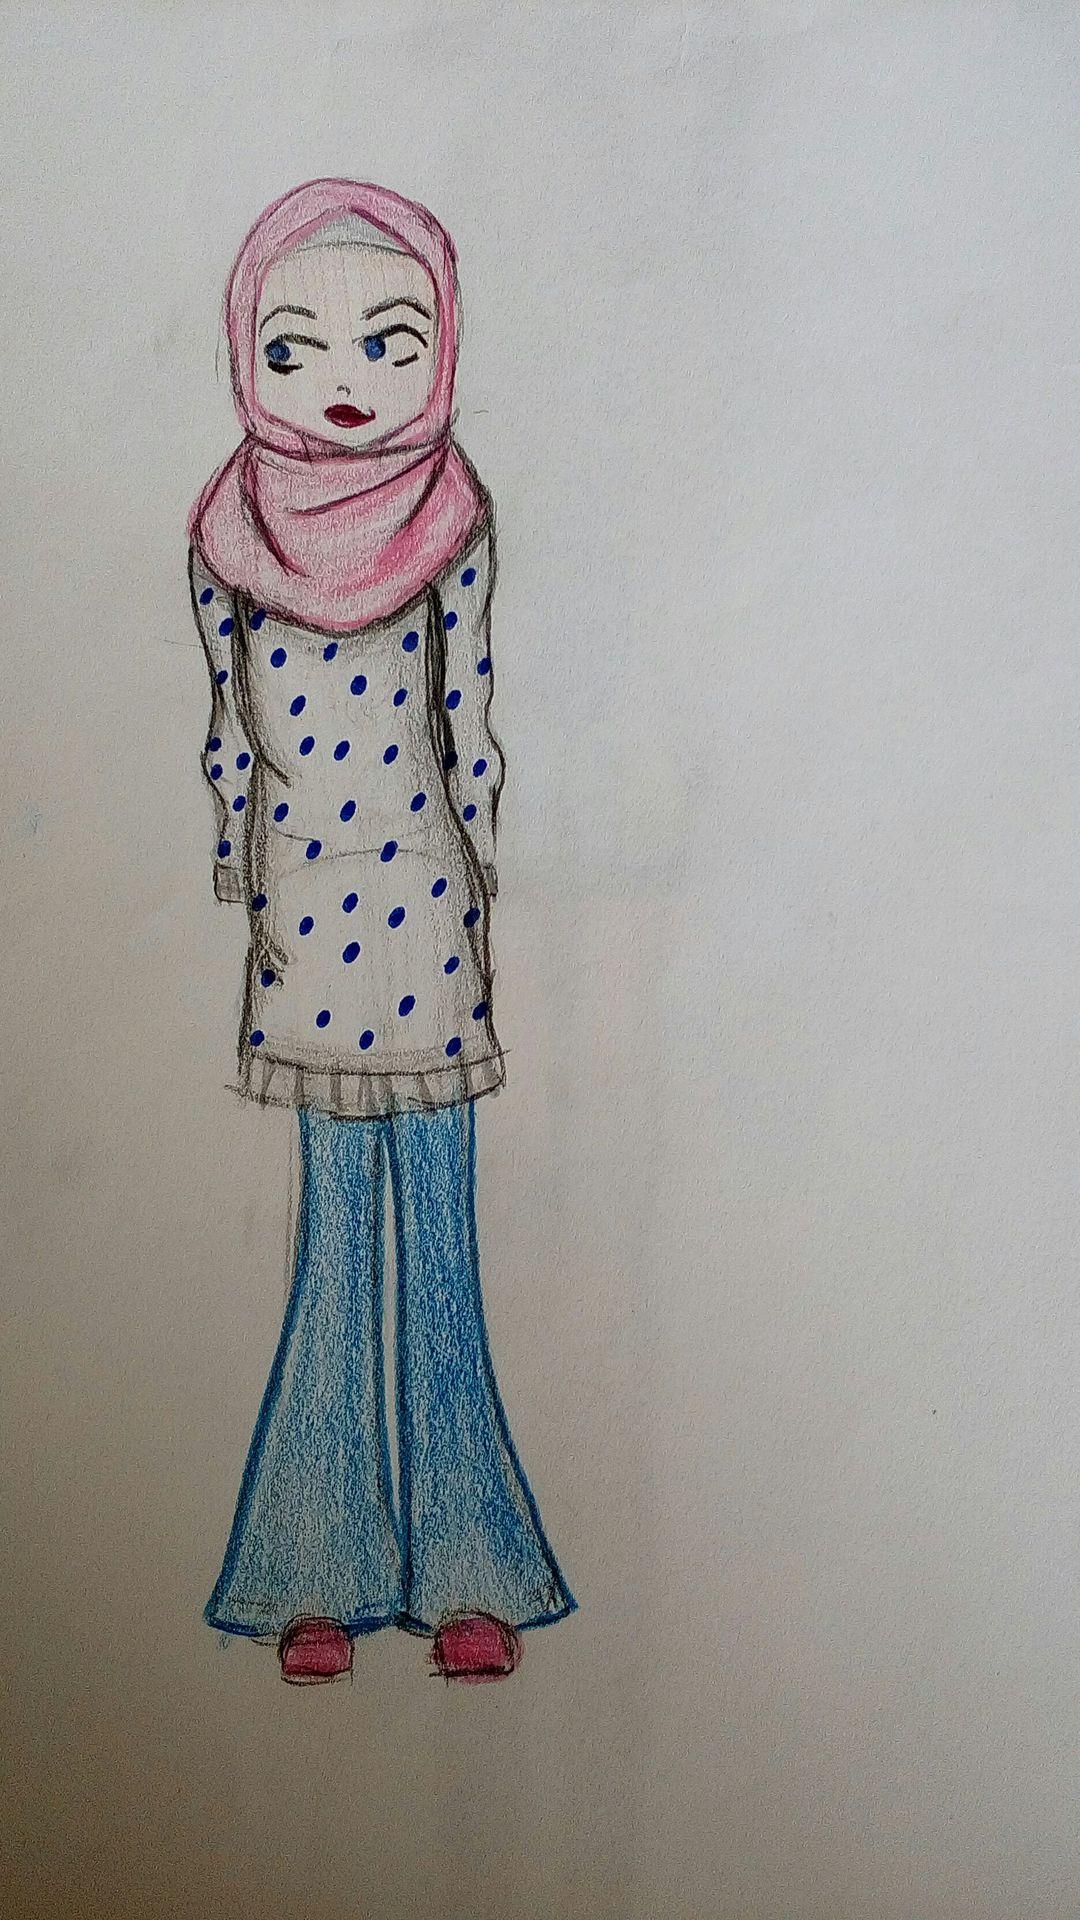 çizimlerim Kapalı Kız Wattpad